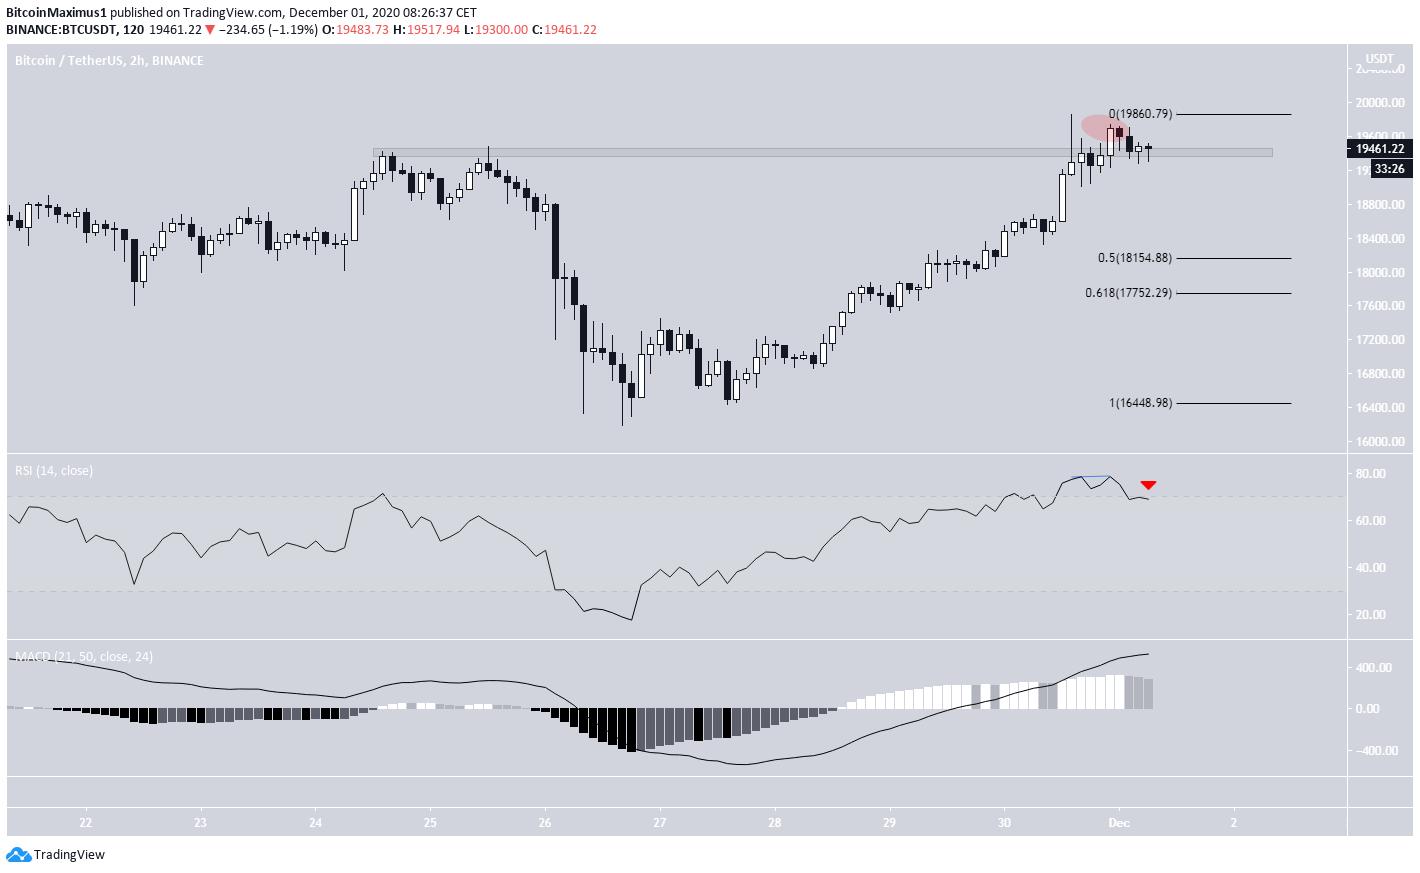 BTC Trading Range